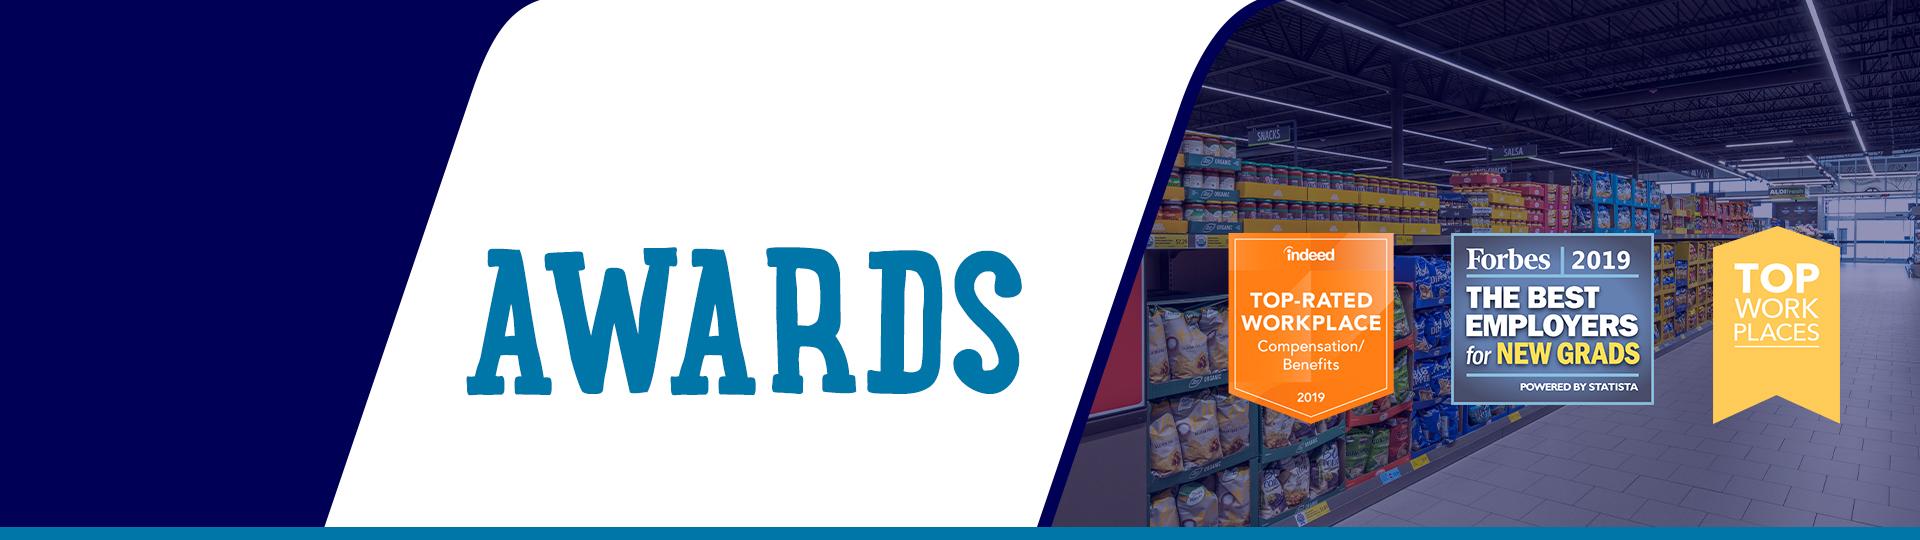 ALDI Awards Page